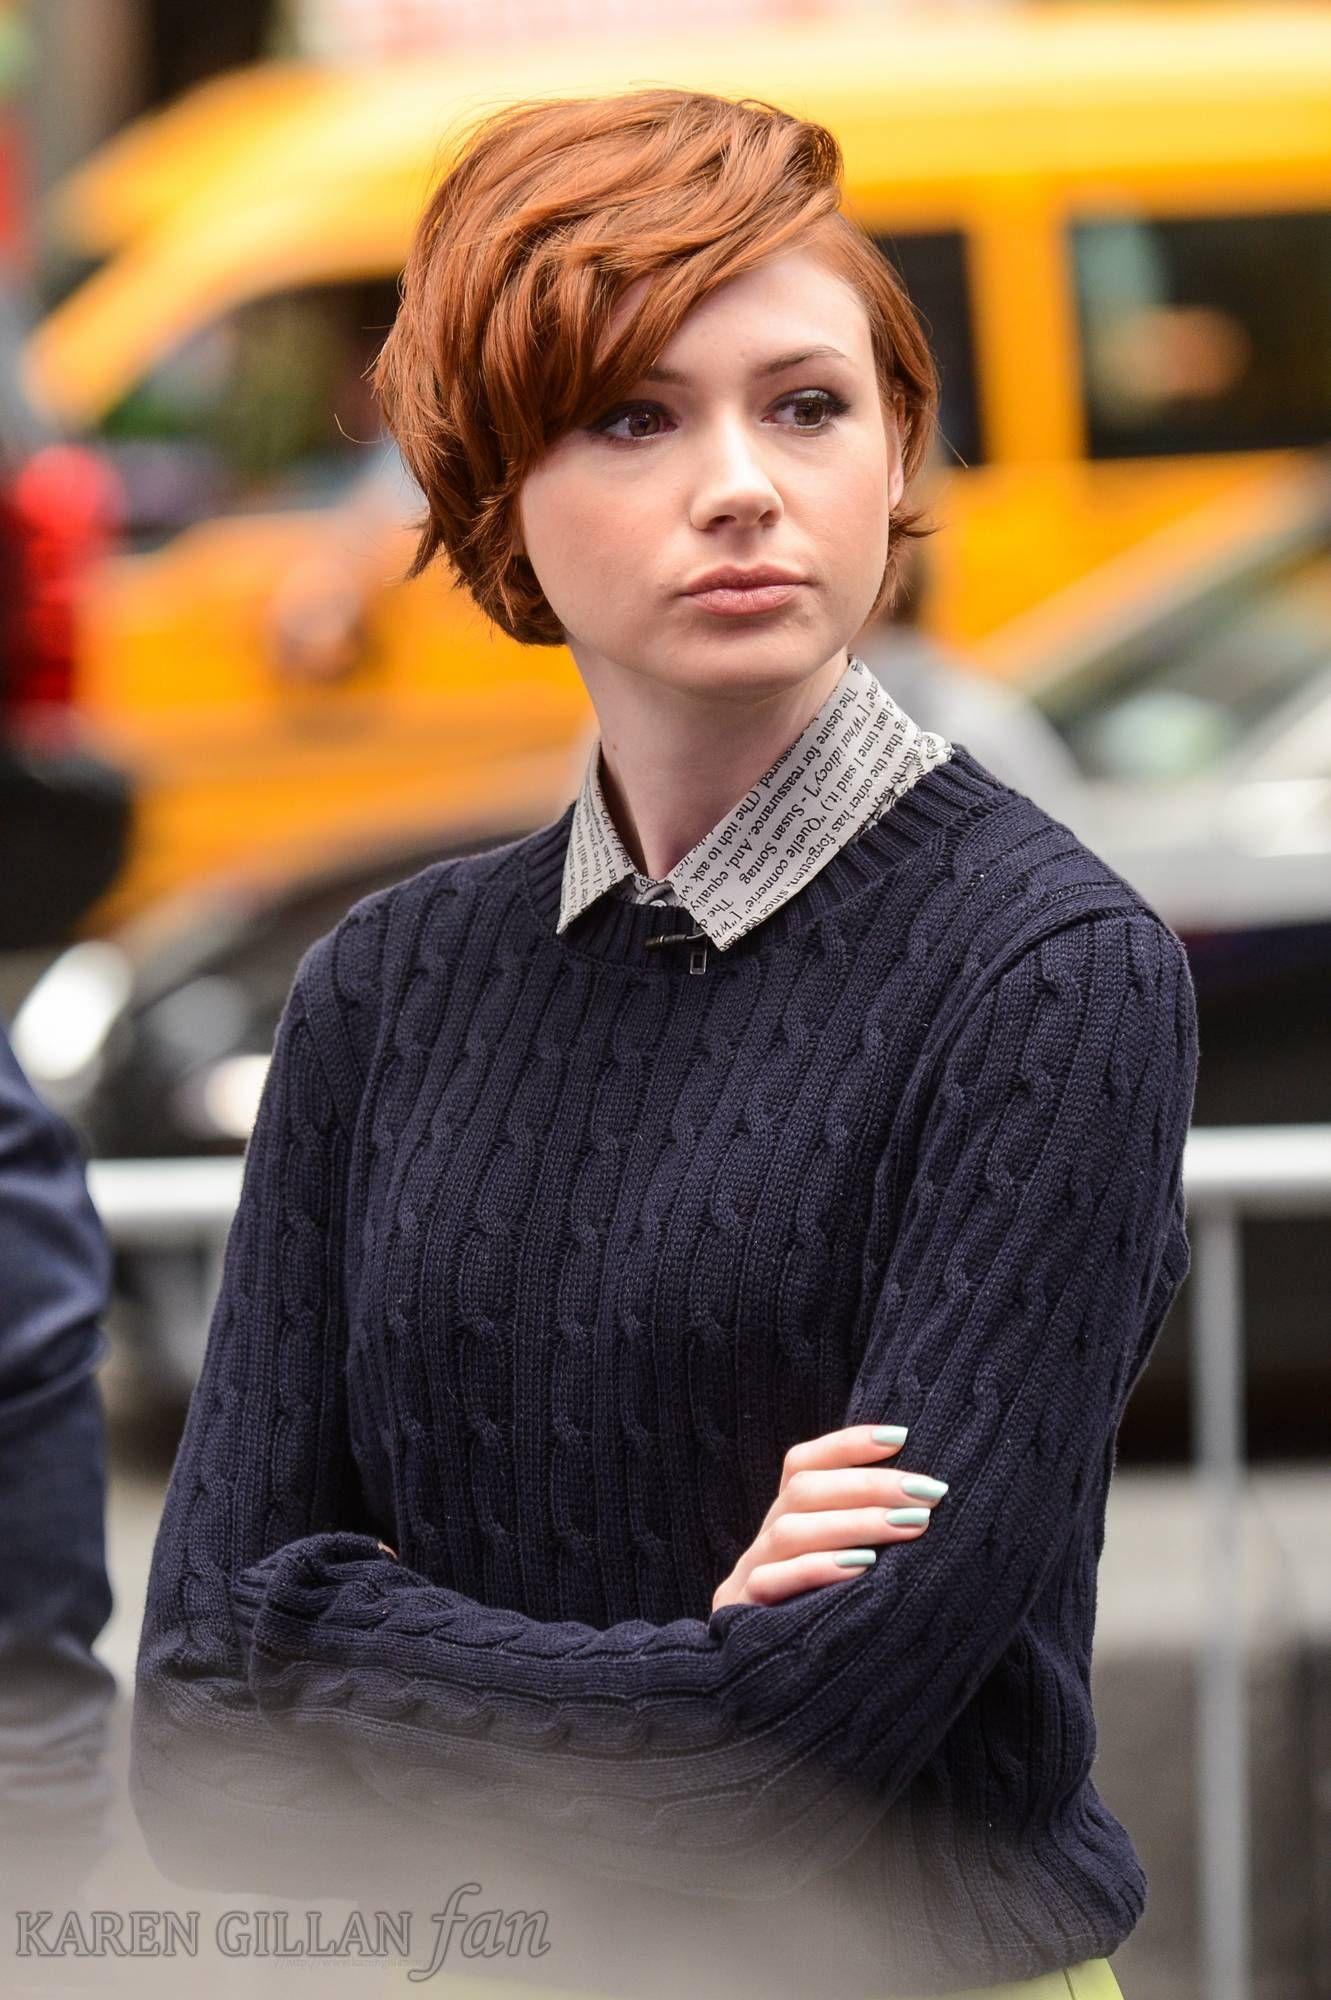 Karen Gillan In 2014 Short Red Hair Short Hair Styles Hair Styles